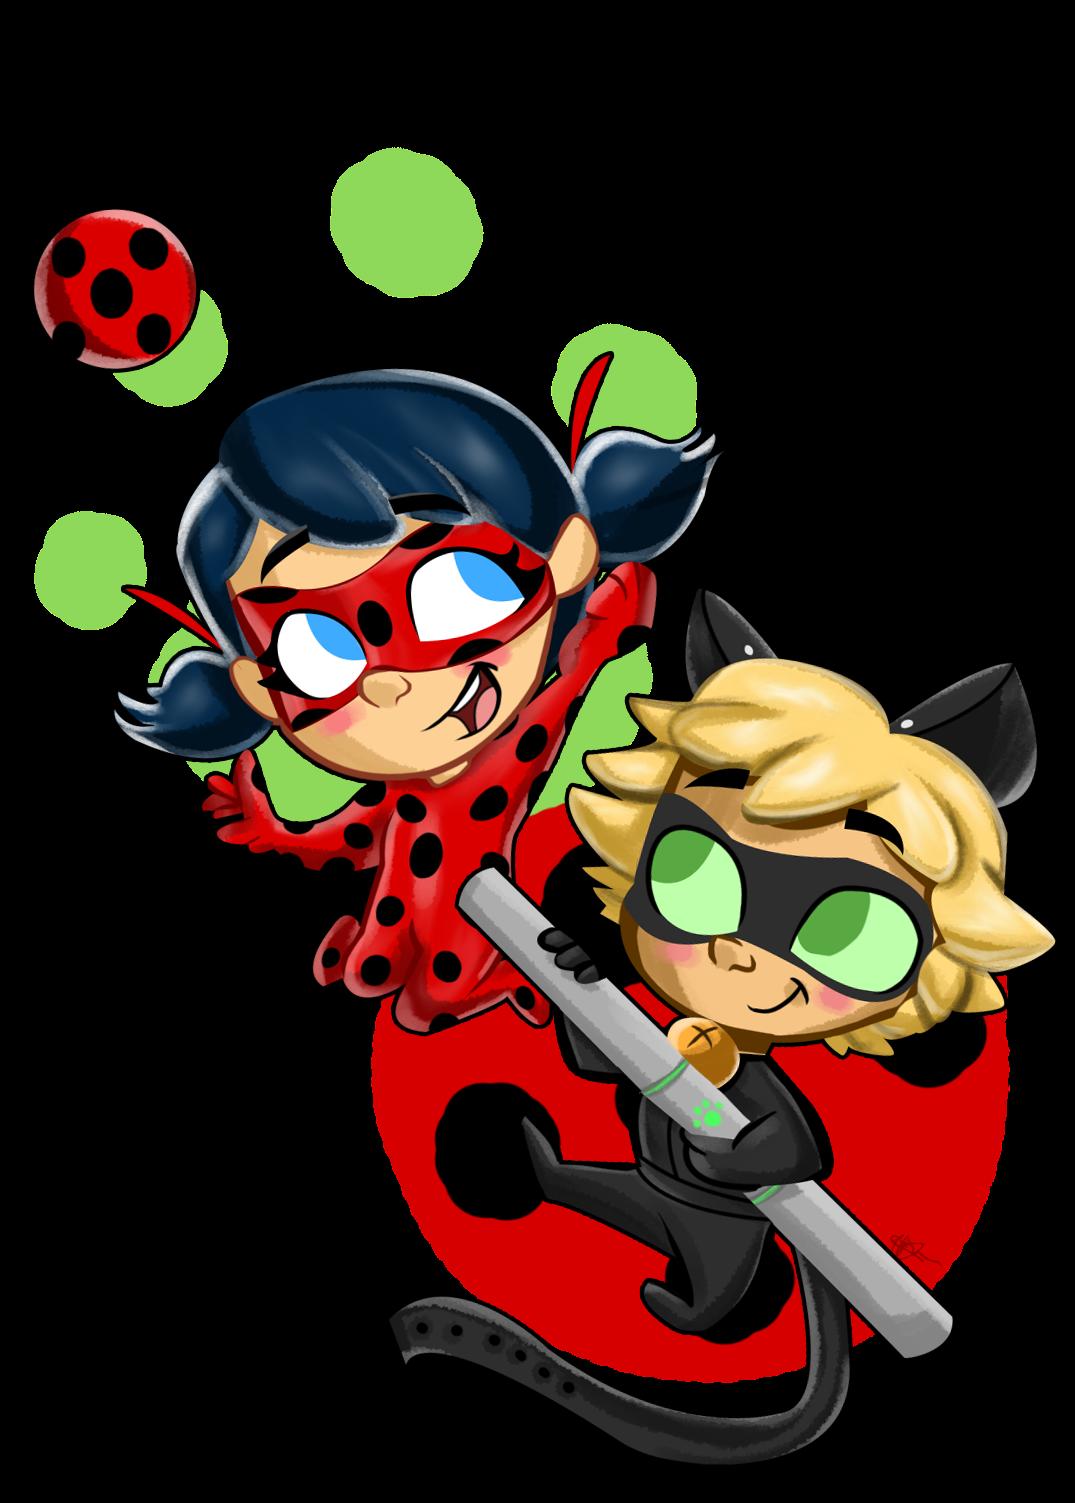 Ladybug And Chat Noir Miraculous Ladybug Fan Art 39777829 Fanpop